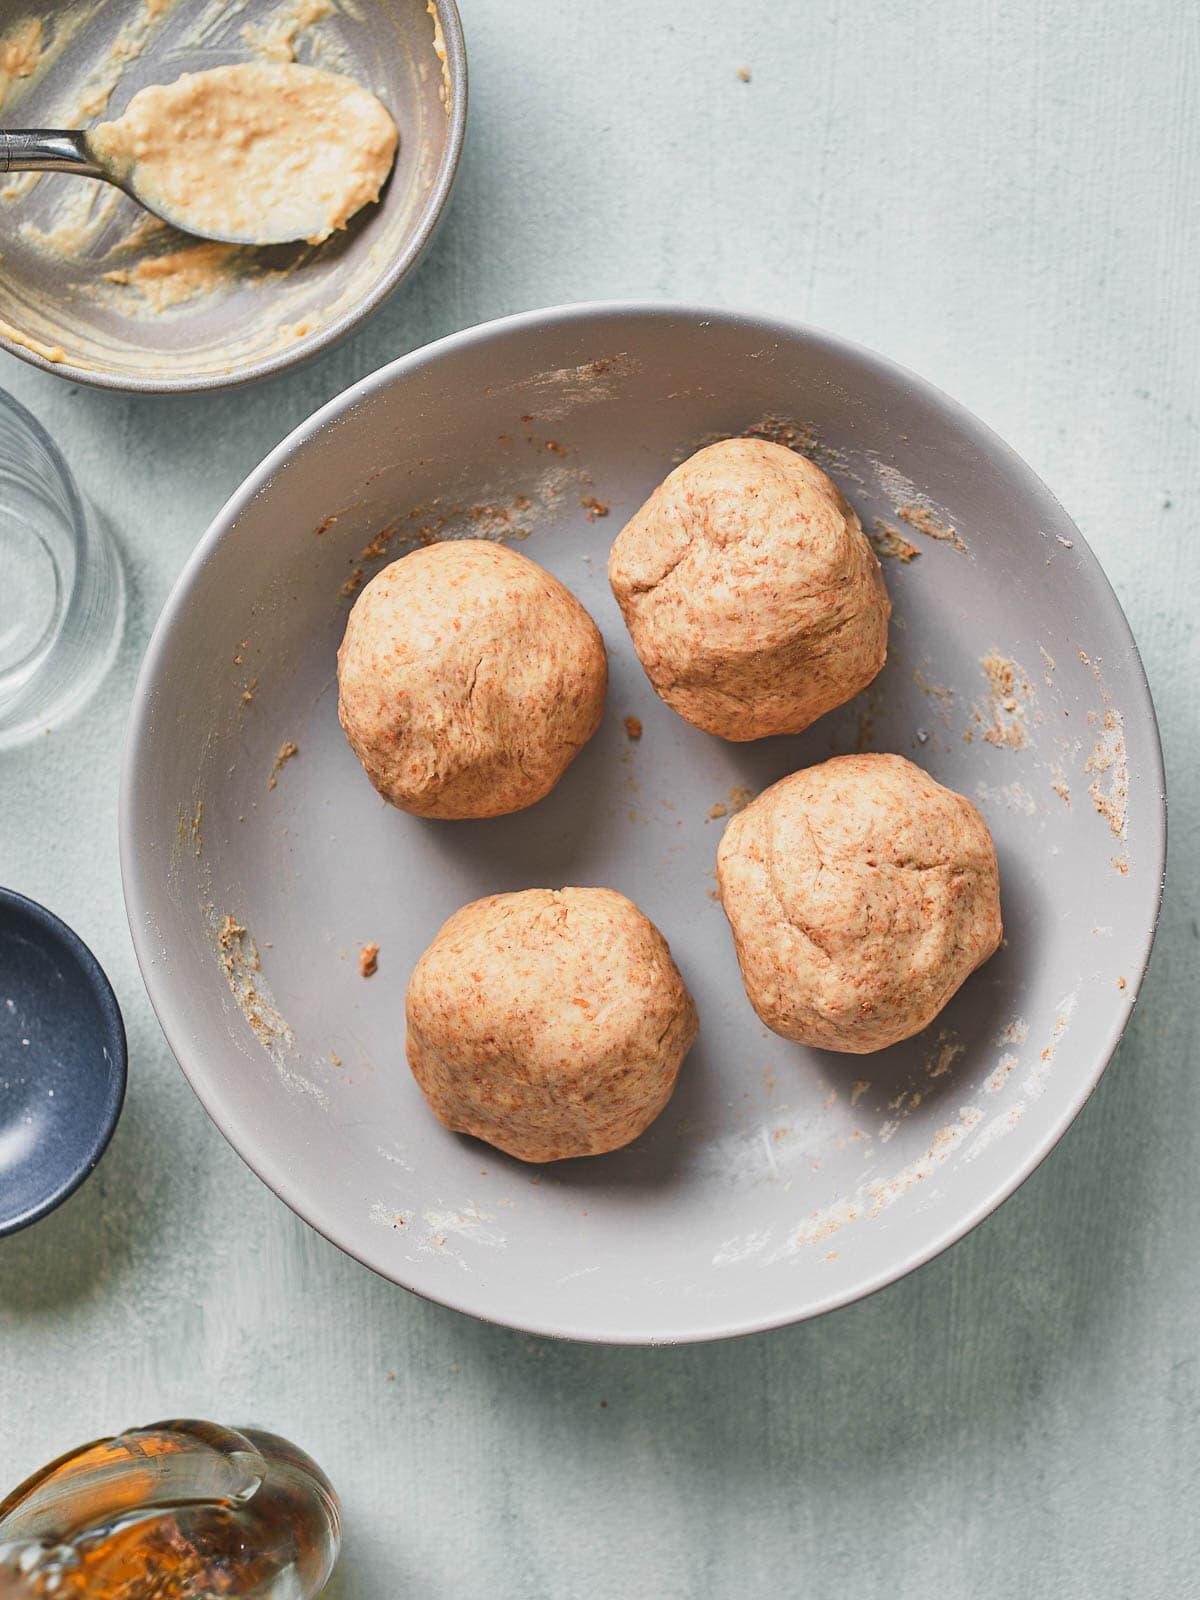 Dough split into four balls